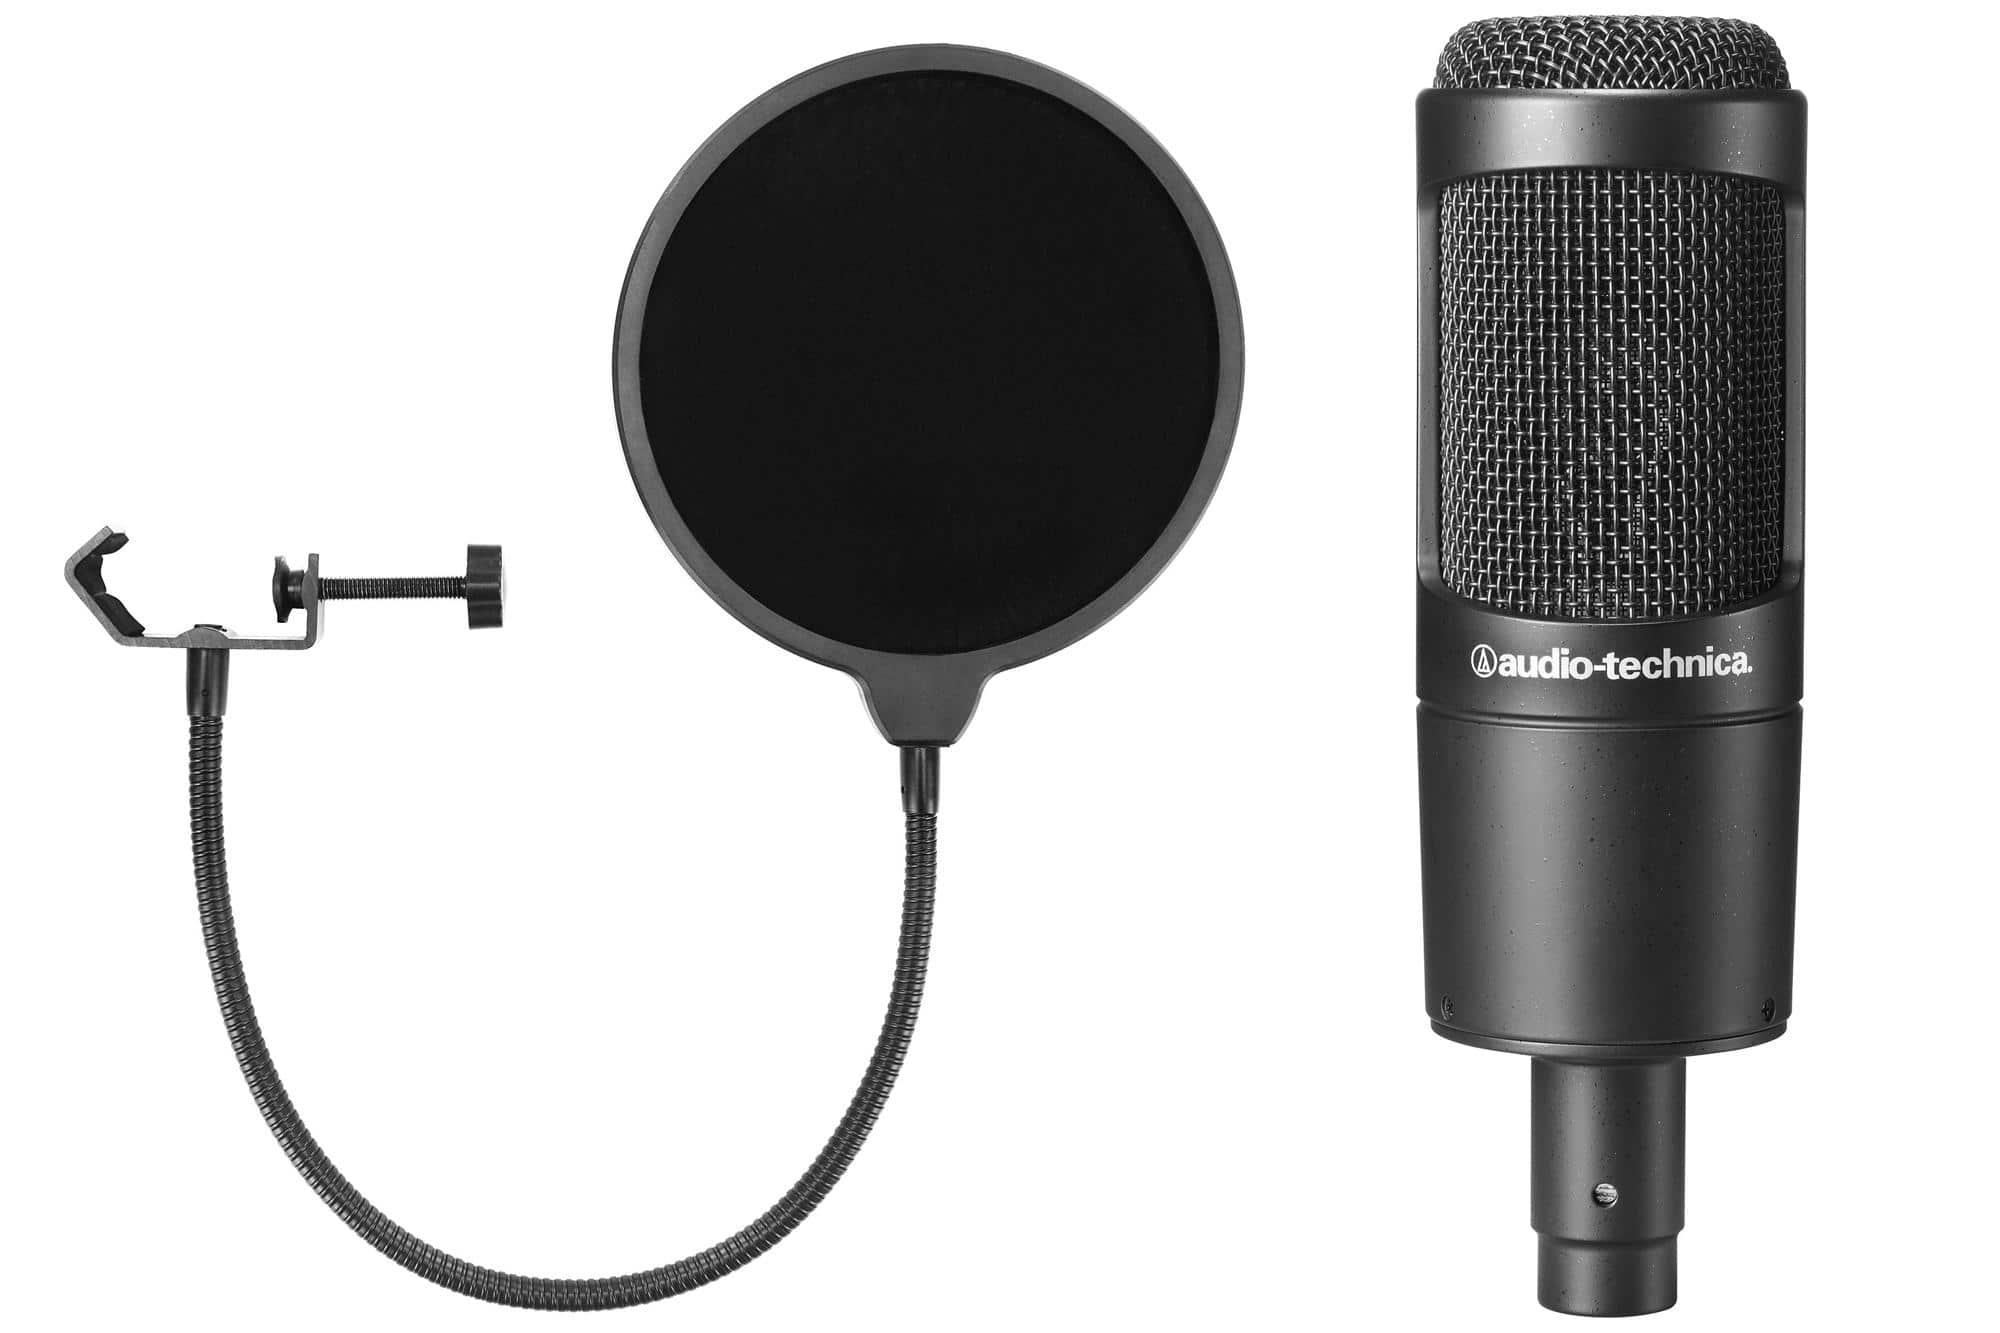 Audio Technica AT2035 Kondensatormikrofon Set inkl. Popkiller